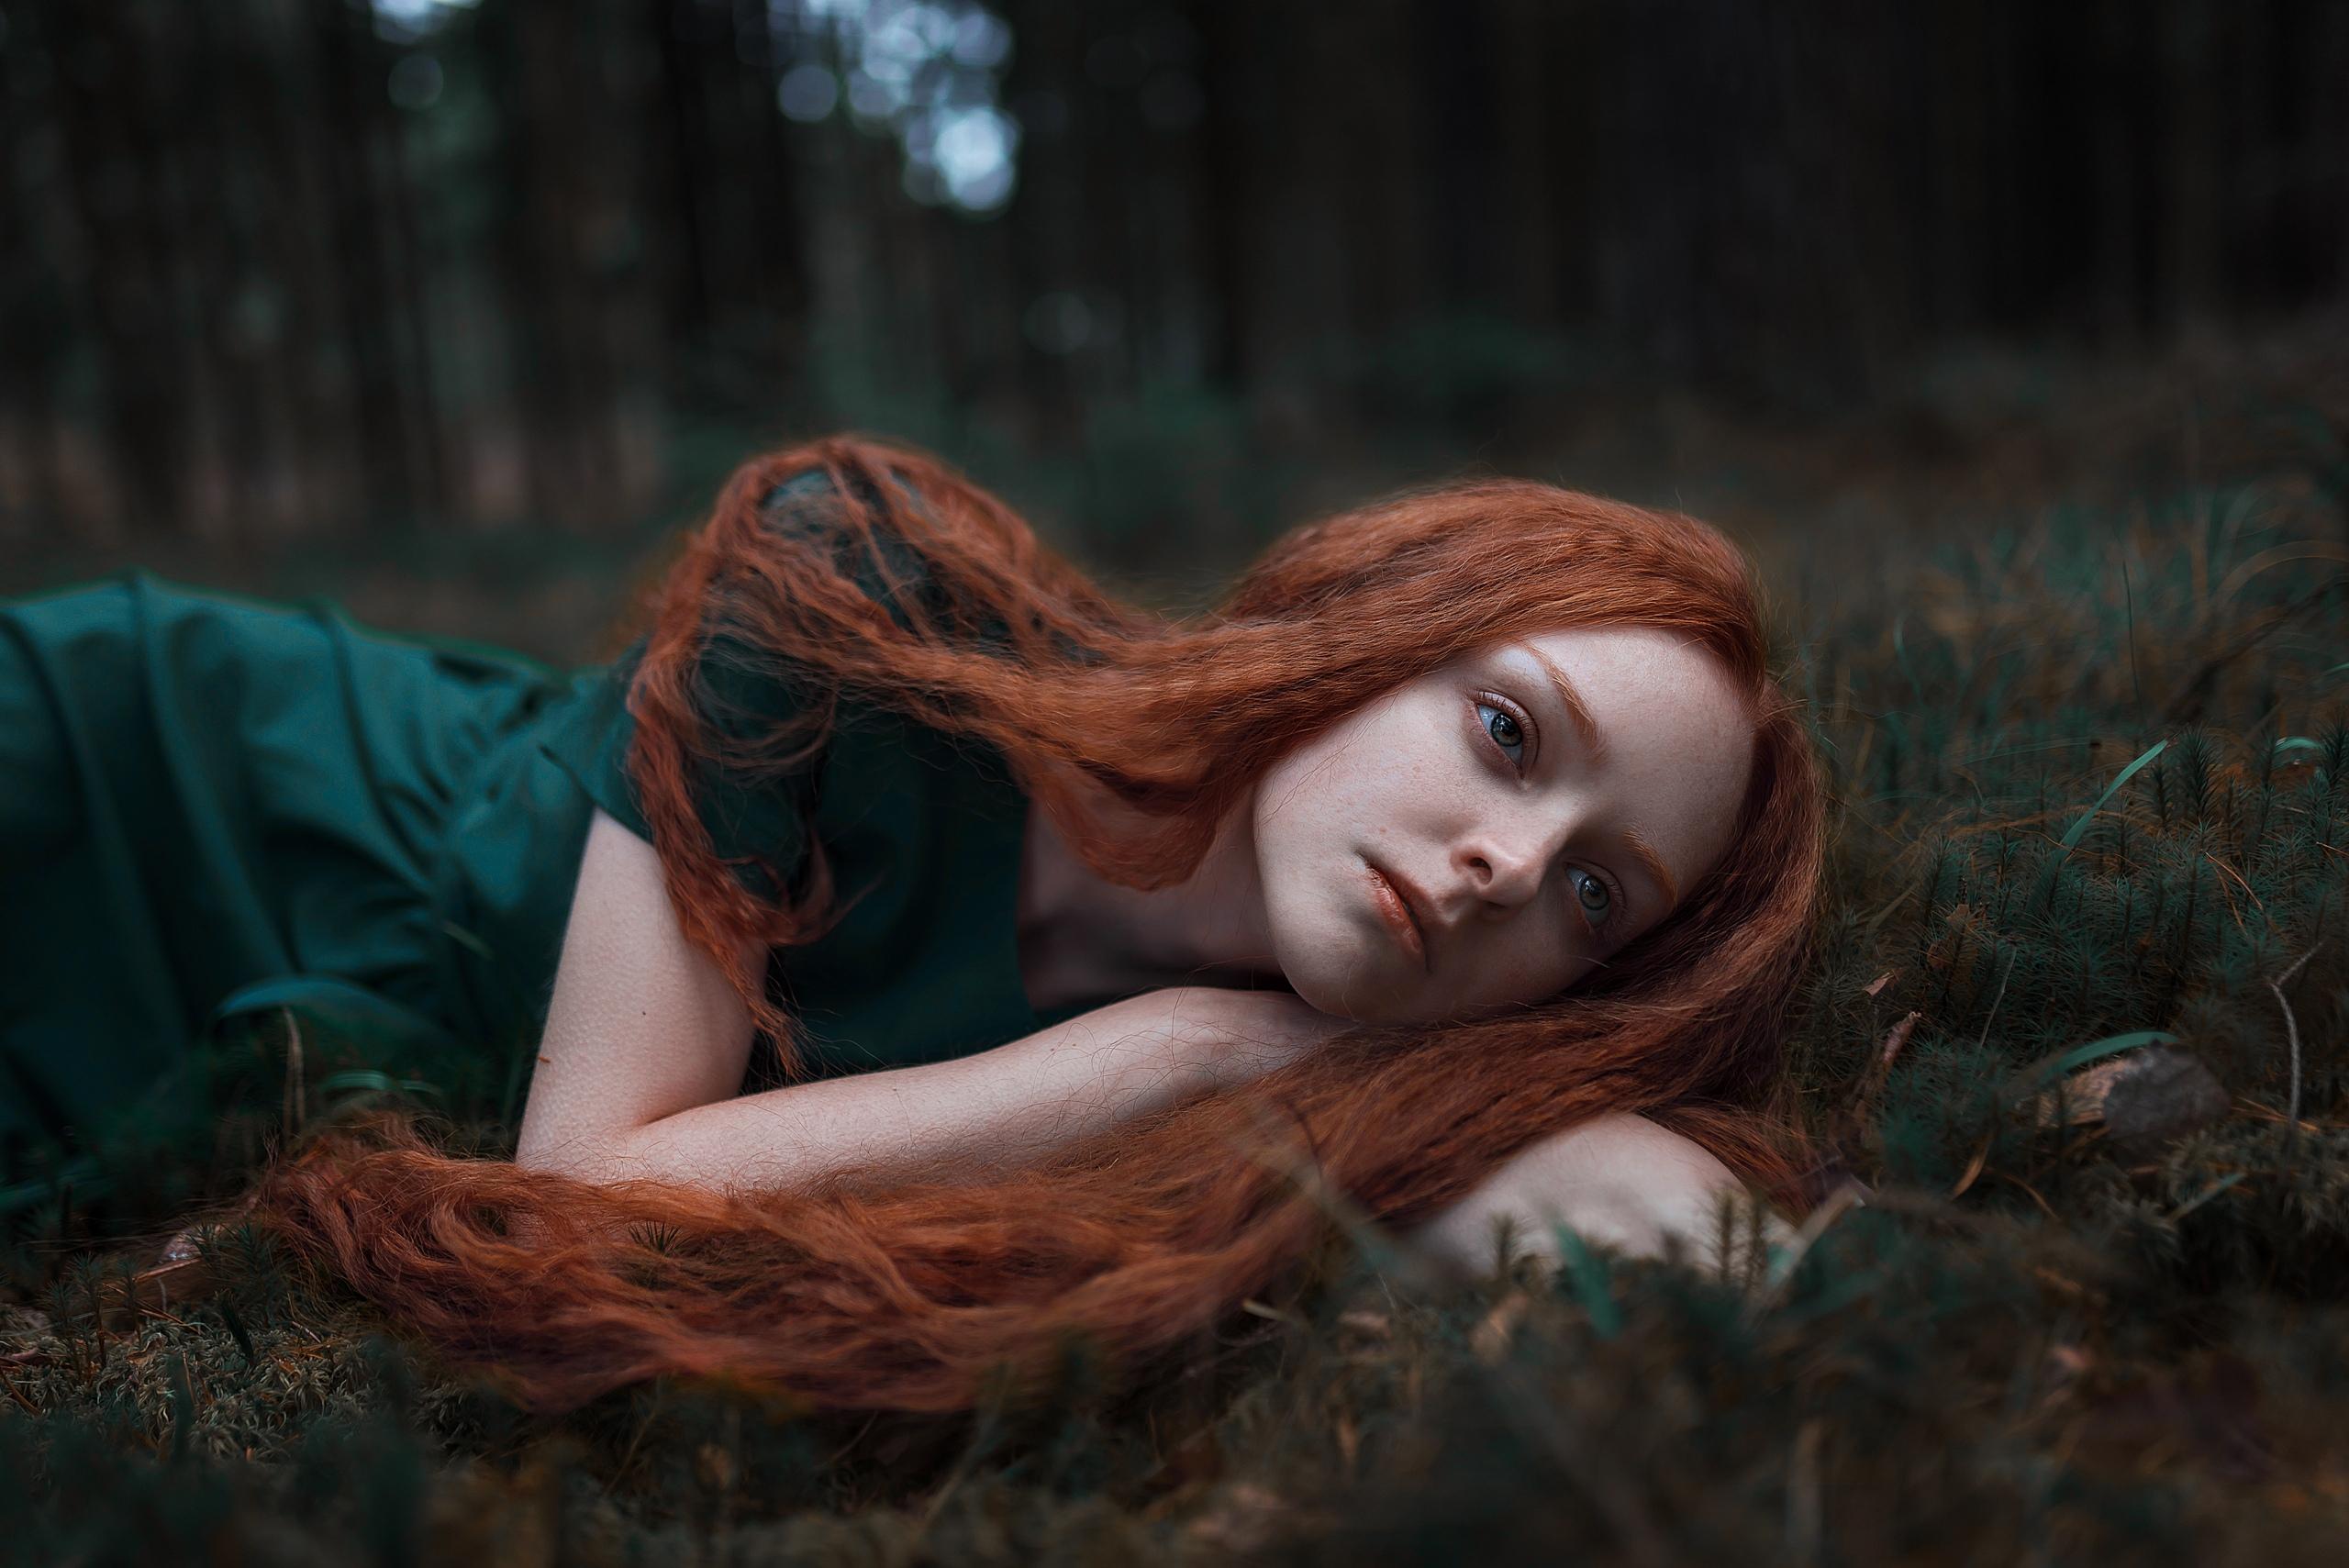 https://www.youngfolks.ru/pub/model-ulyana-naydenkova-33415975